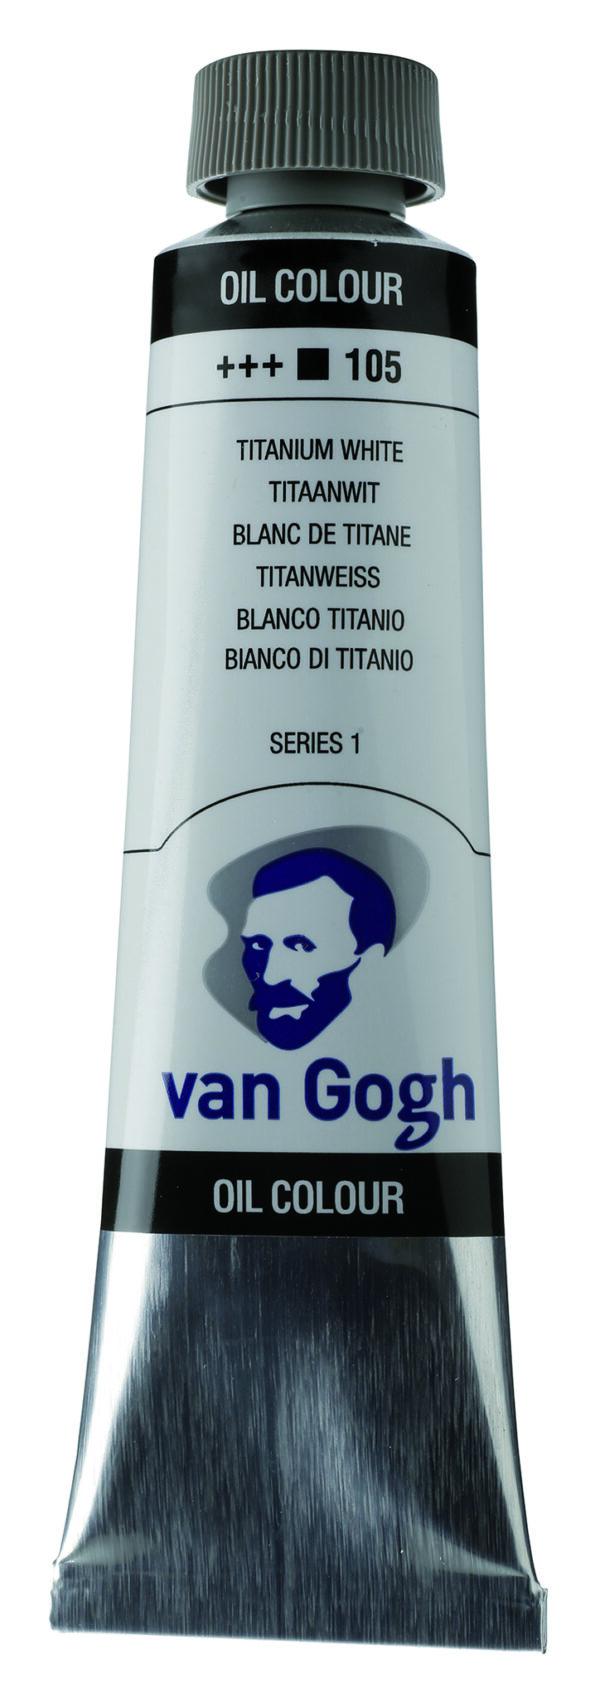 Van Gogh 105 Titanium white (safflor oil) - 40 ml